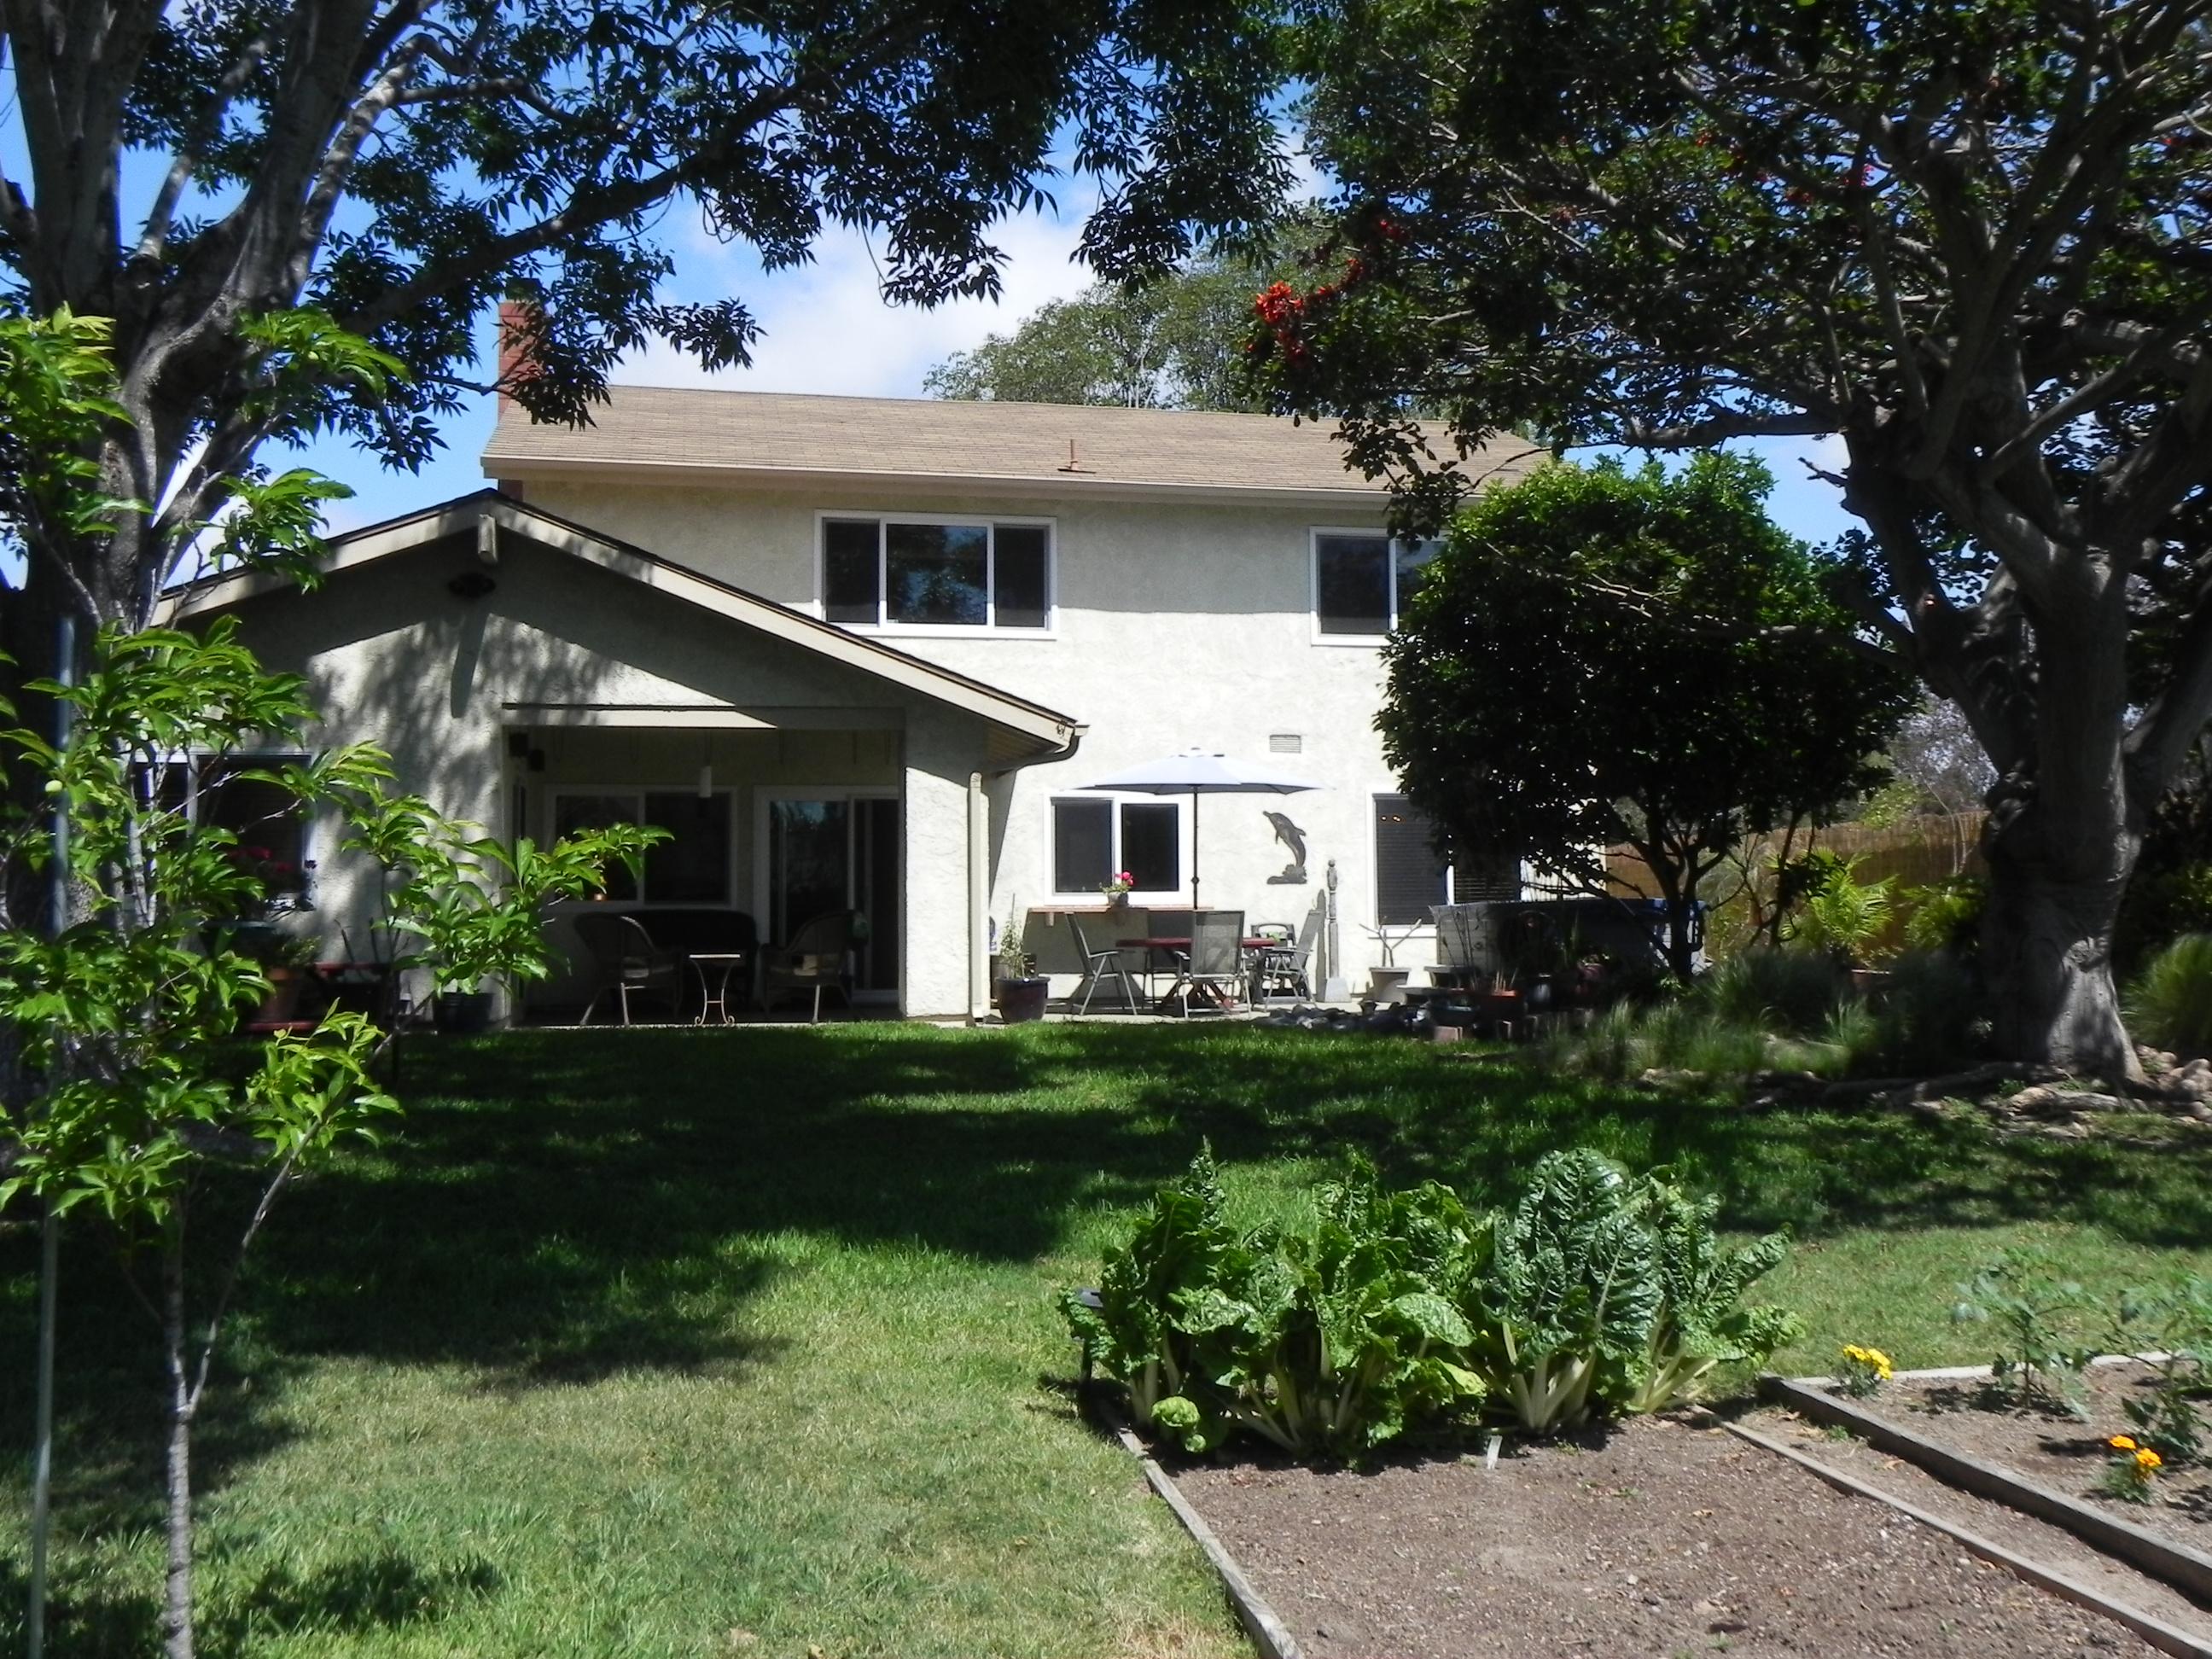 Backyard paradise in Via Marina Home for Sale 3400 Keel Ave Oxnard CA